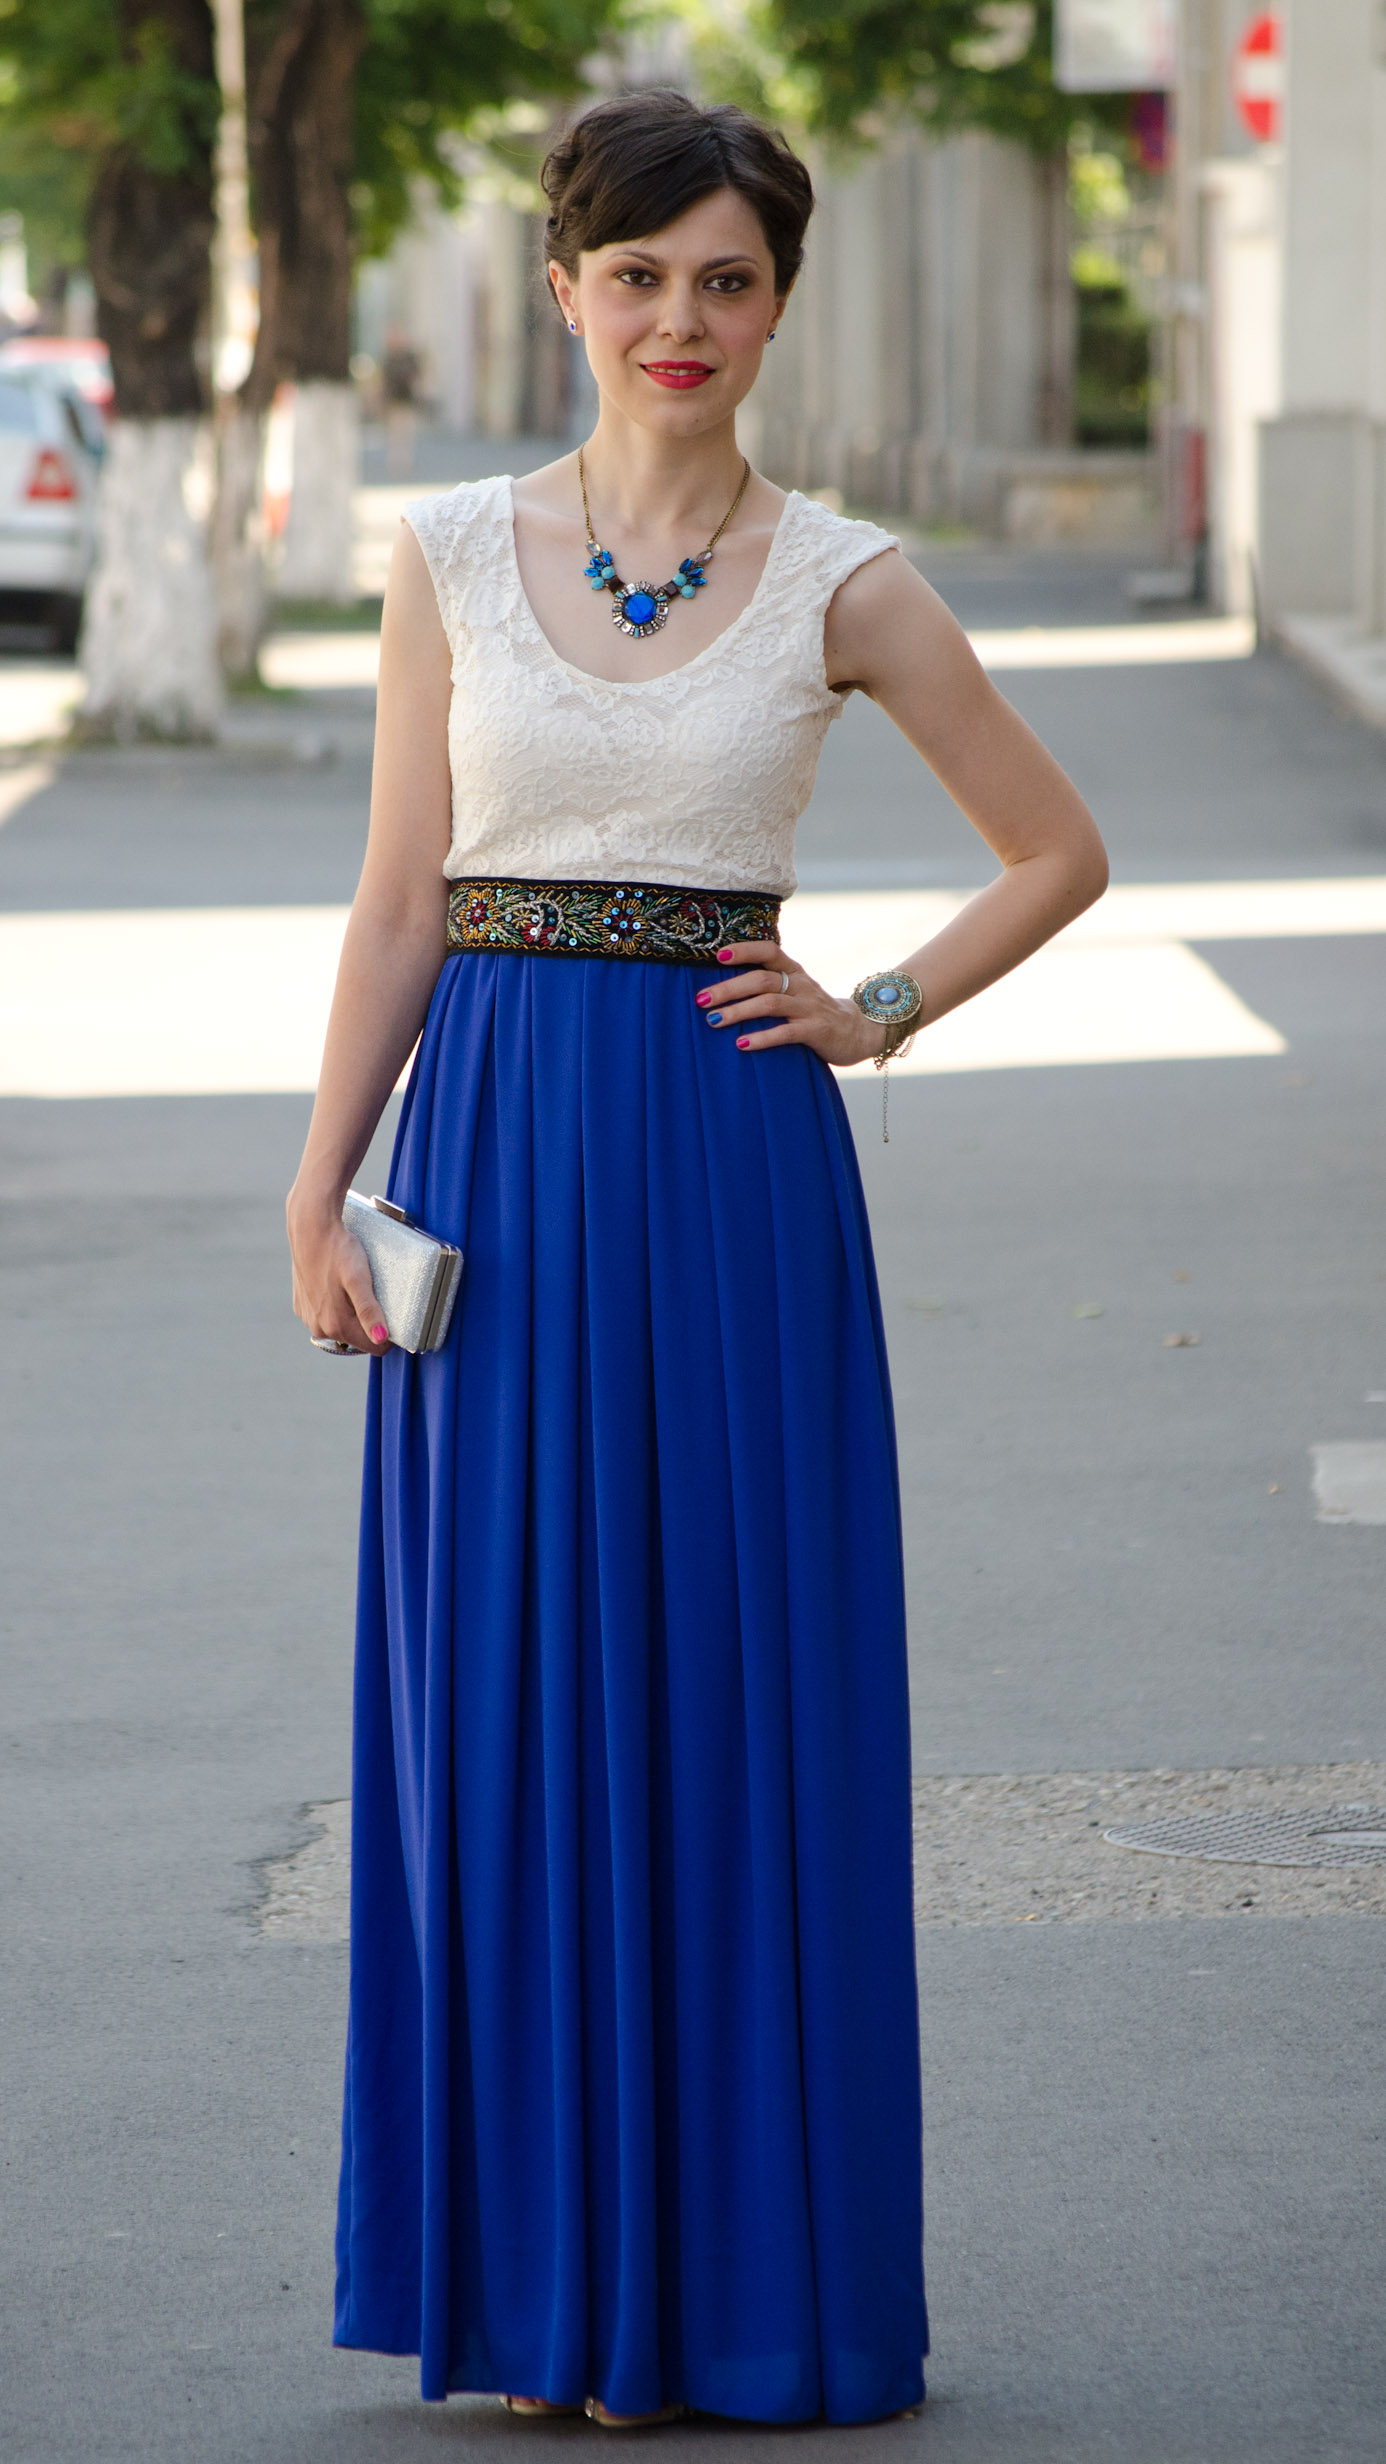 Fancy Maxi Dresses For Weddings Saddha